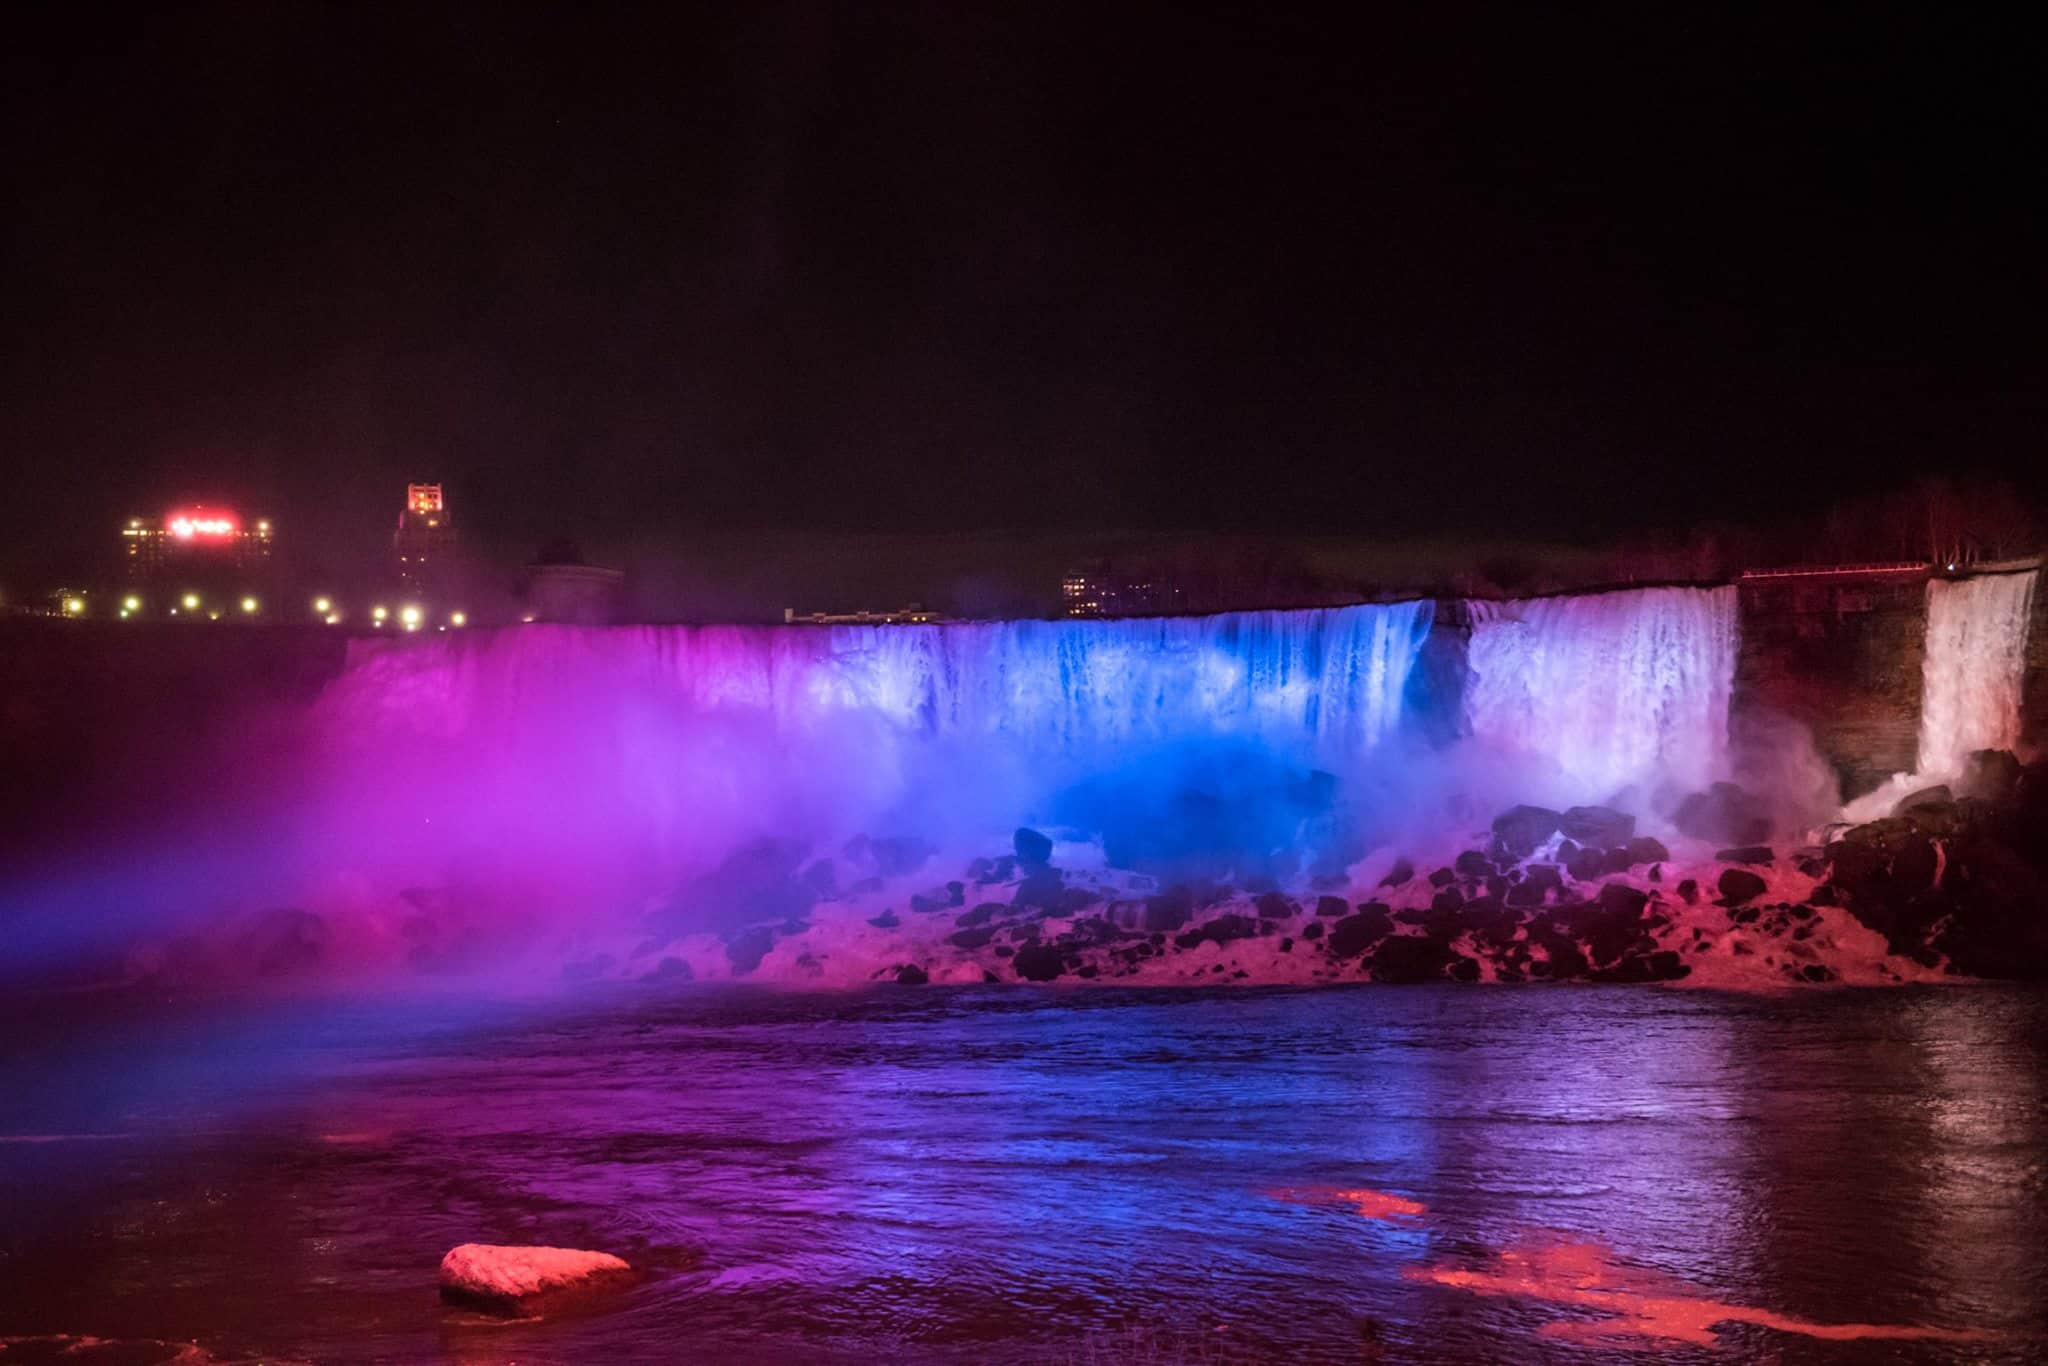 Fall Festival Wallpaper Niagara Falls Shines In New Light